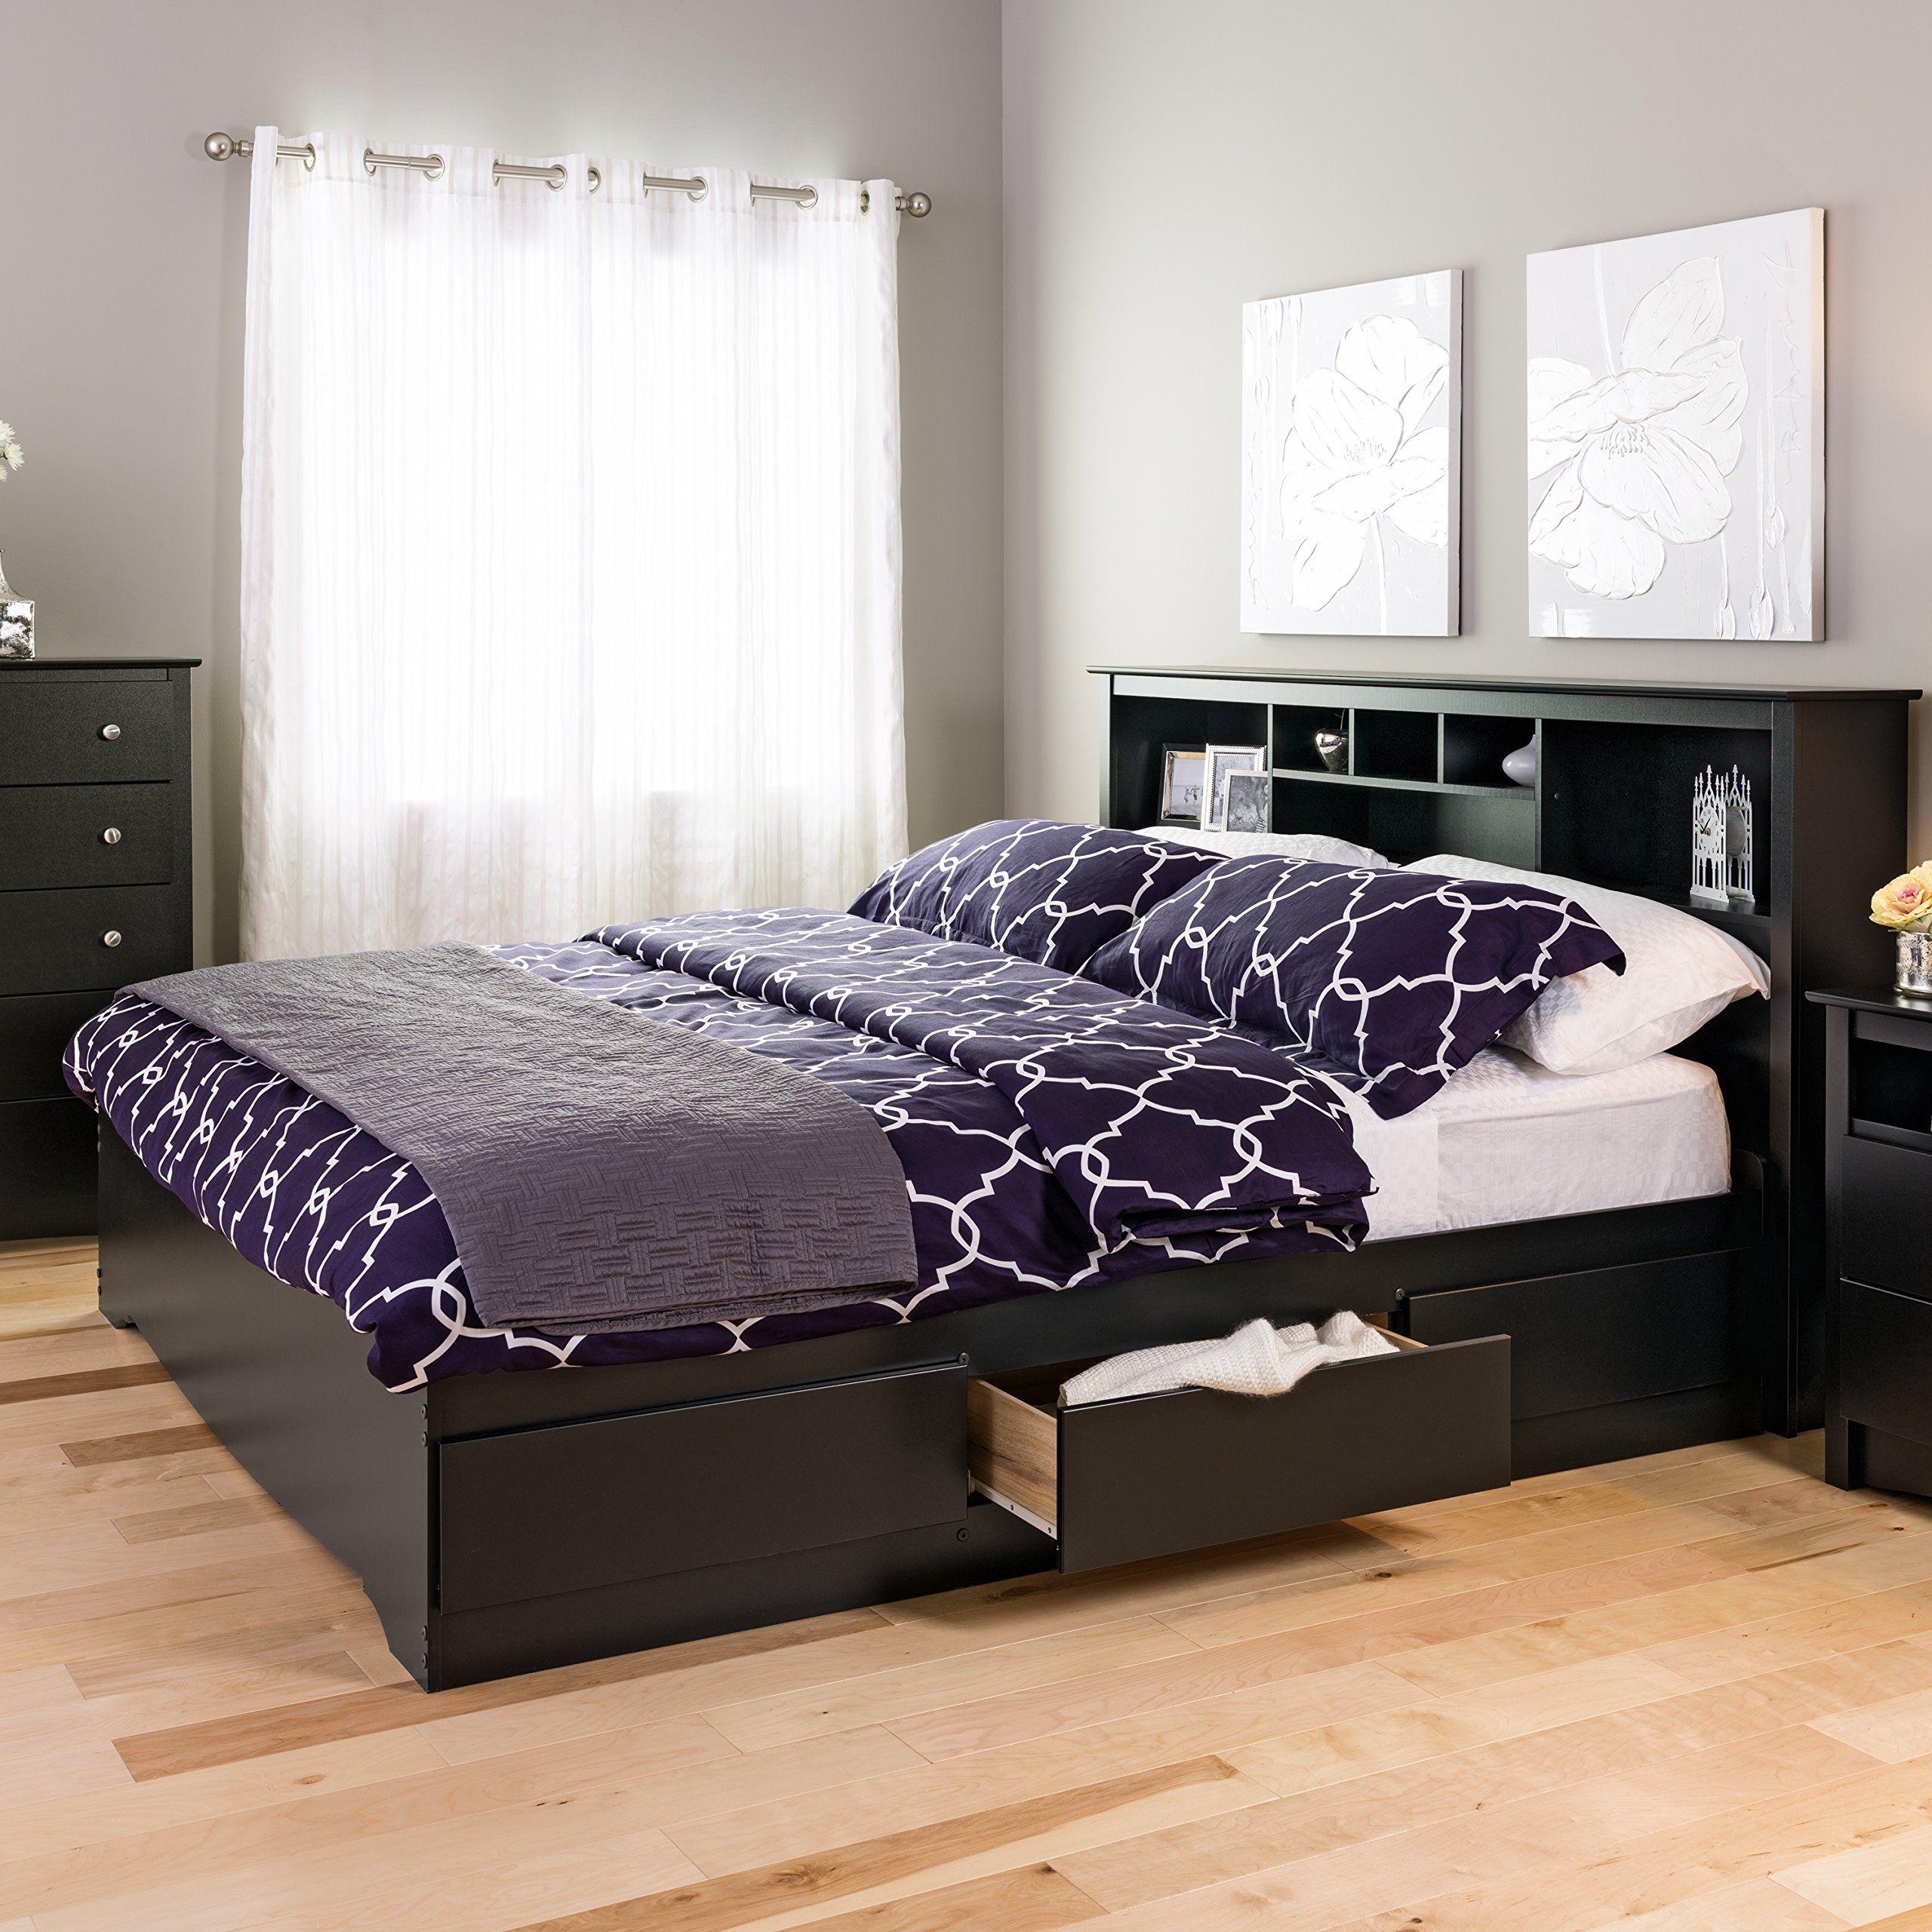 Prepac Sonoma King Platform Storage Bed Black